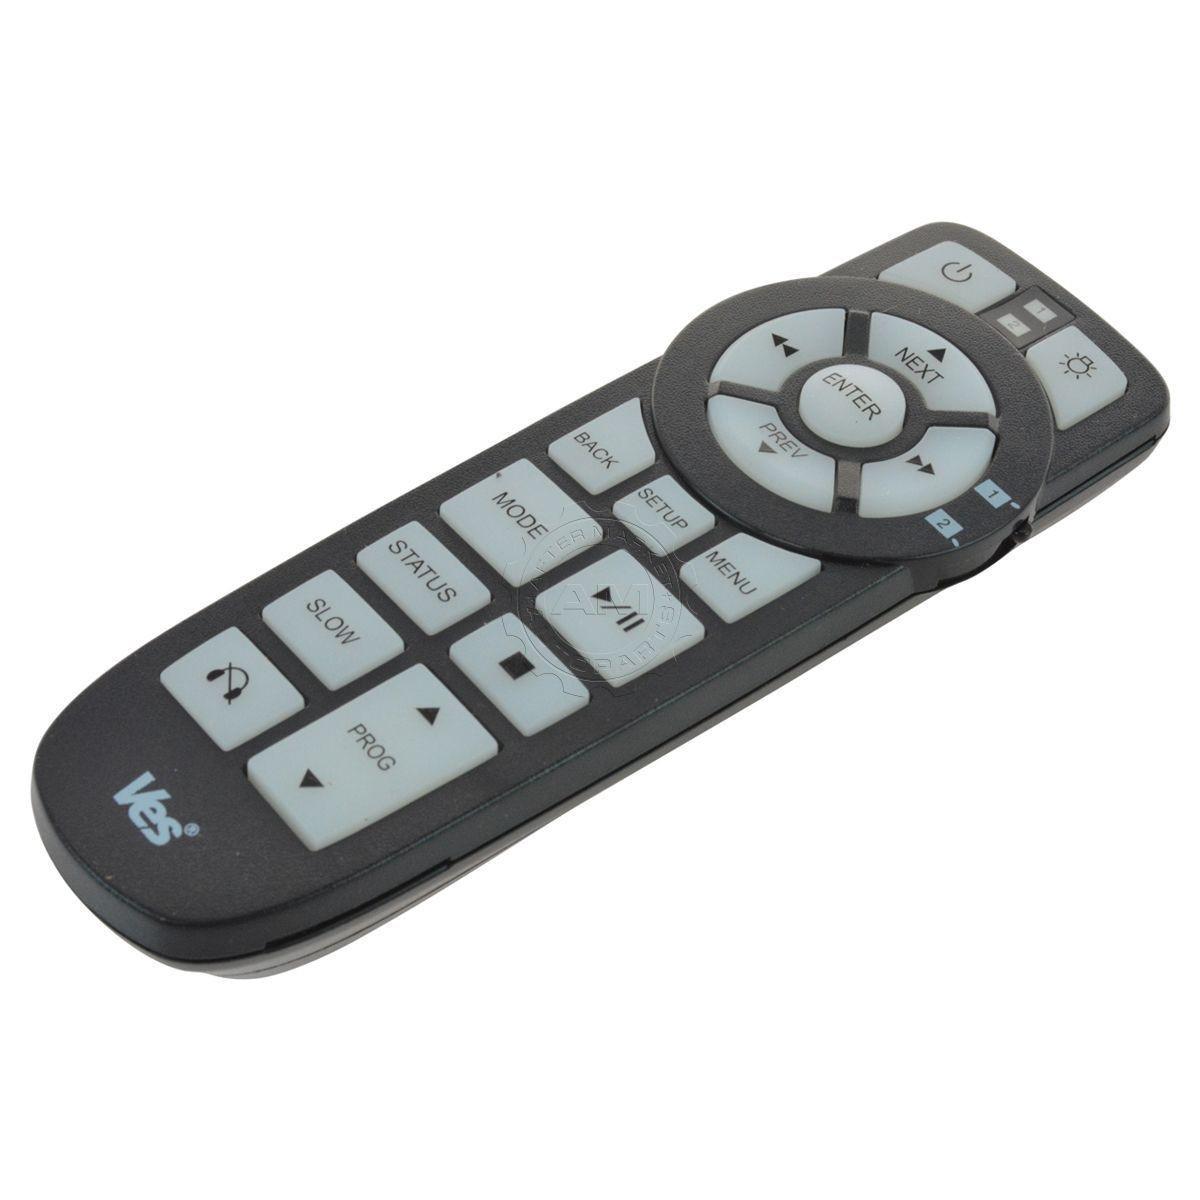 2008-2018 Dodge Durango VES DVD Remote Control